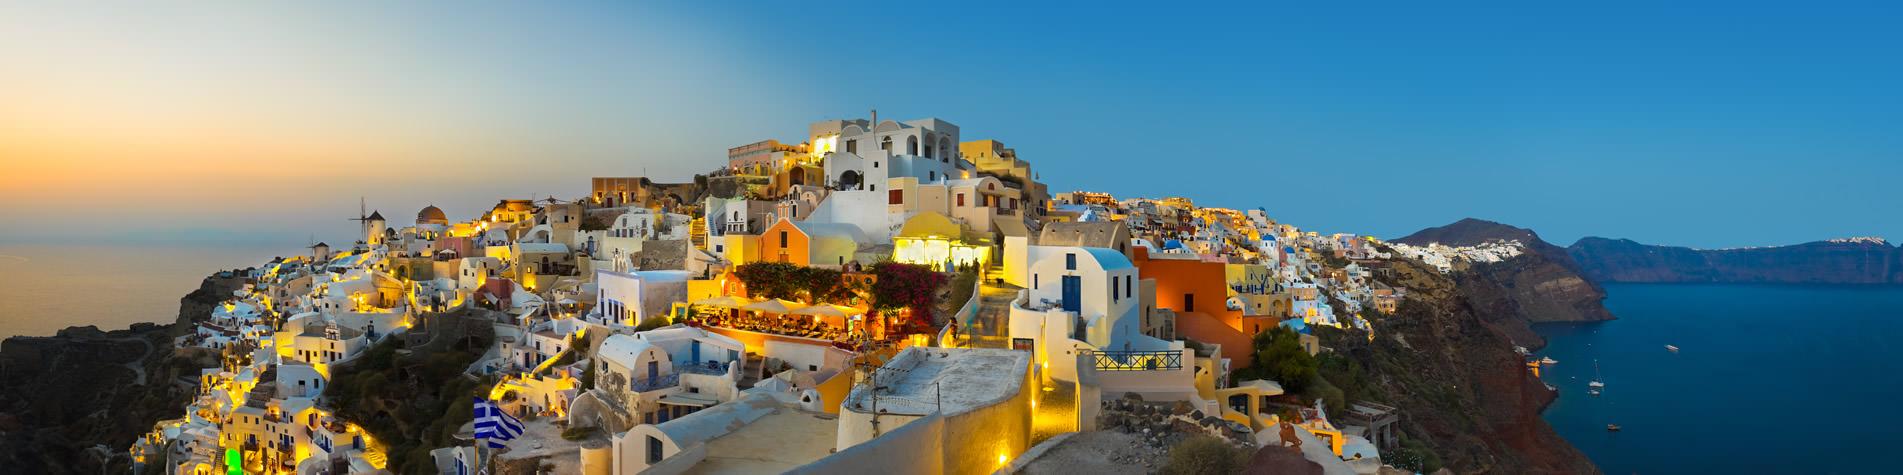 Santorini Island Holidays with Cyplon Holidays